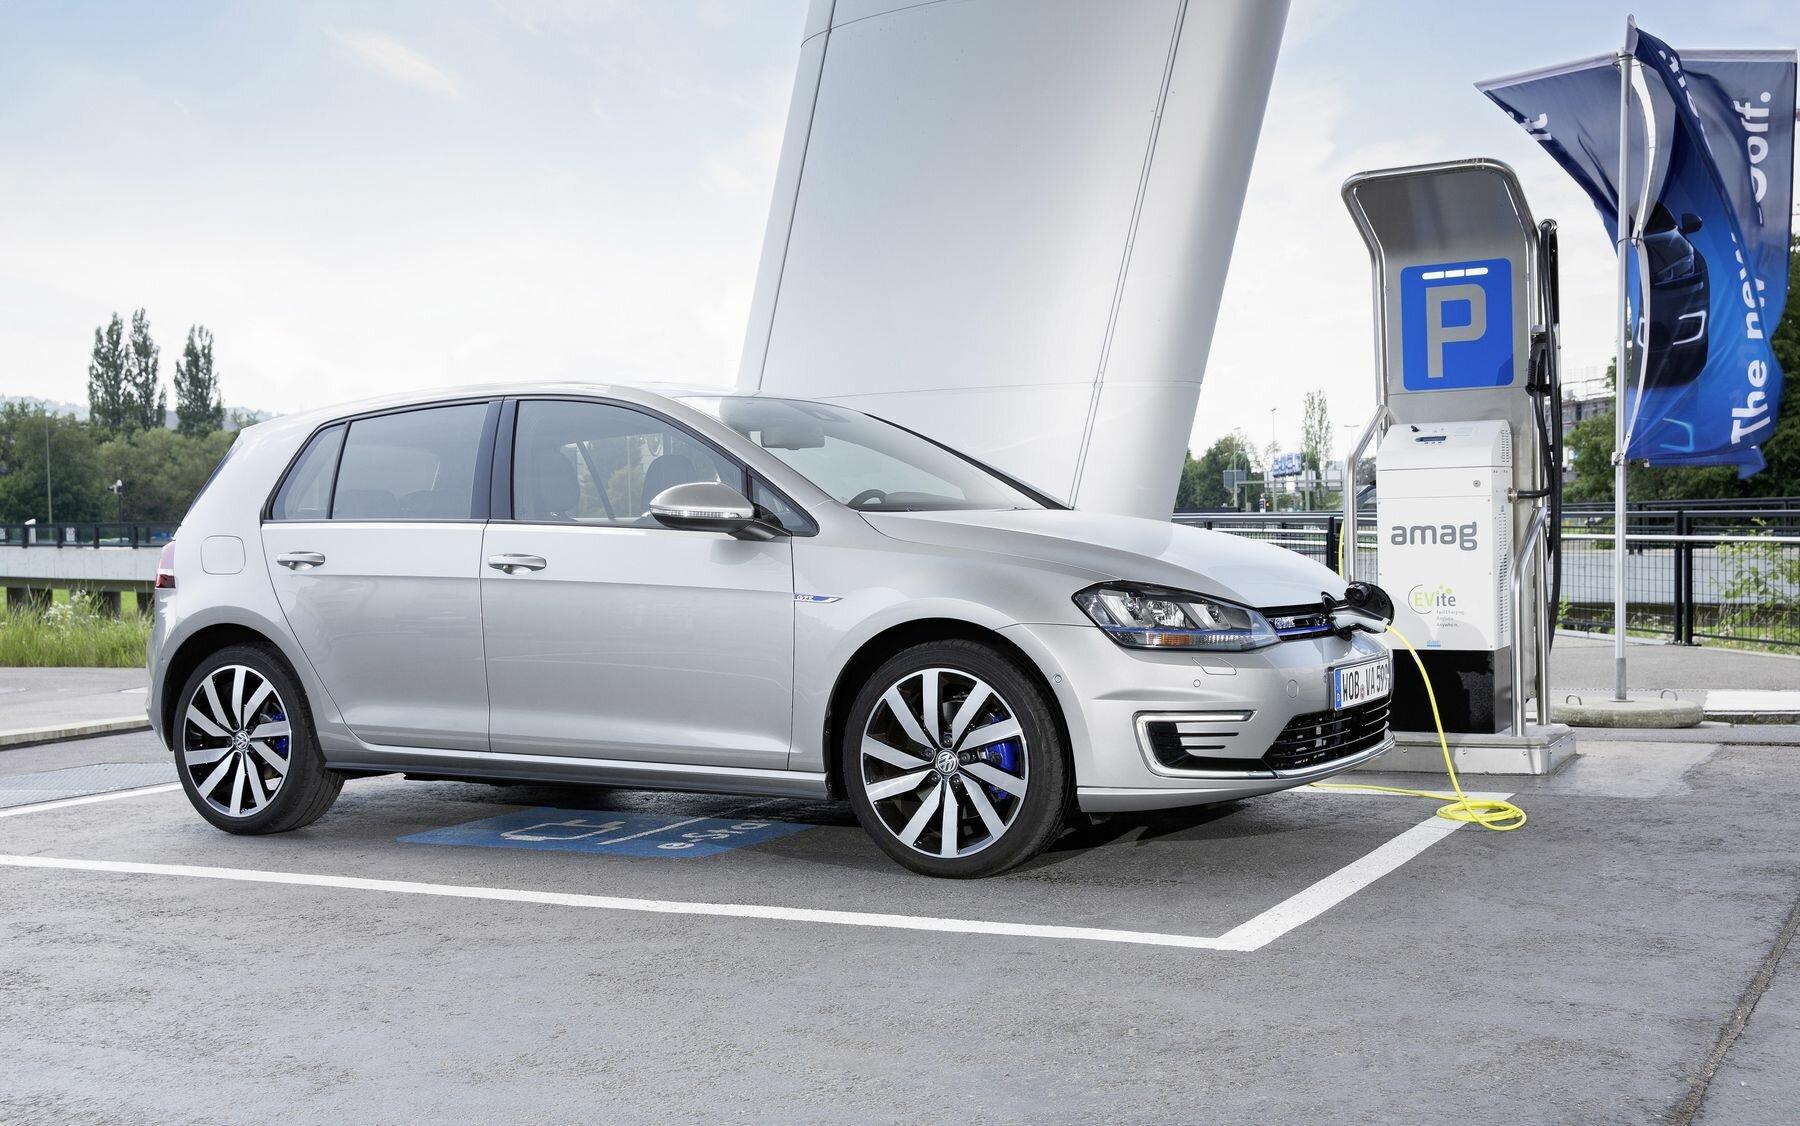 Golf Gte Test >> Volkswagen Golf Gte Plug In Hybrid Review Rating And Range